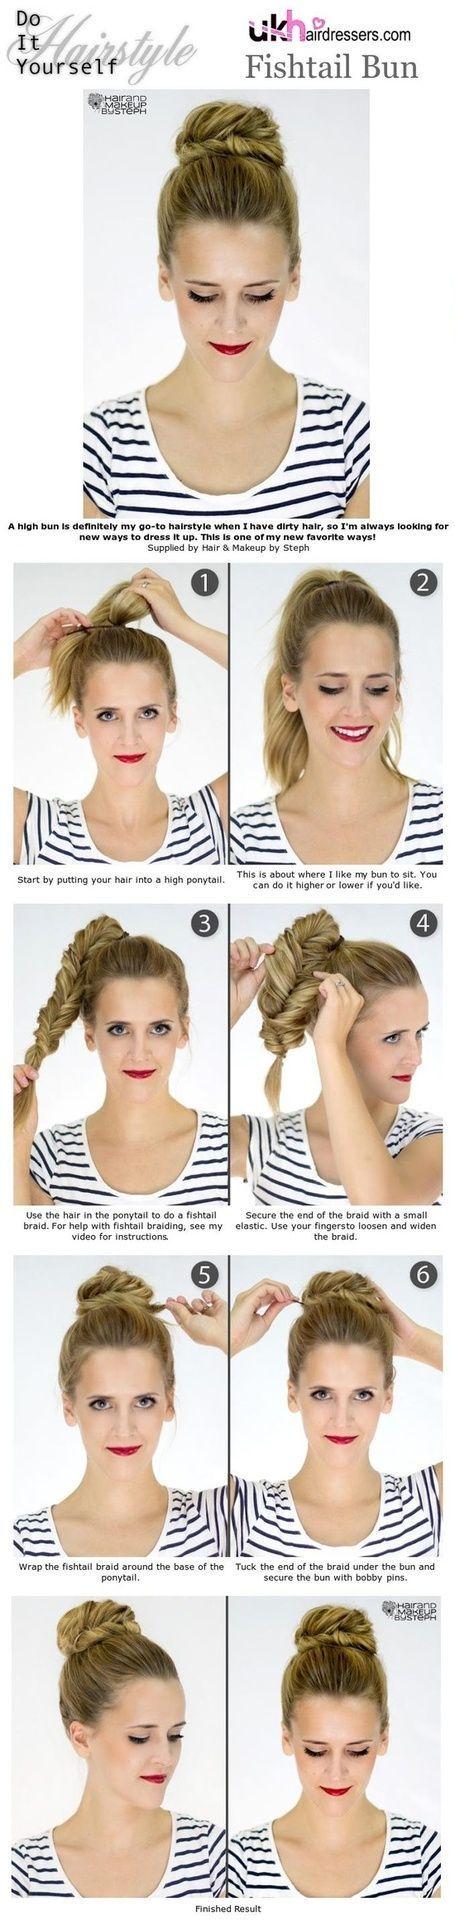 Diy hairstyles httpweddingmemorabiliaspot hairstyles diy hairstyles httpweddingmemorabiliaspot solutioingenieria Choice Image